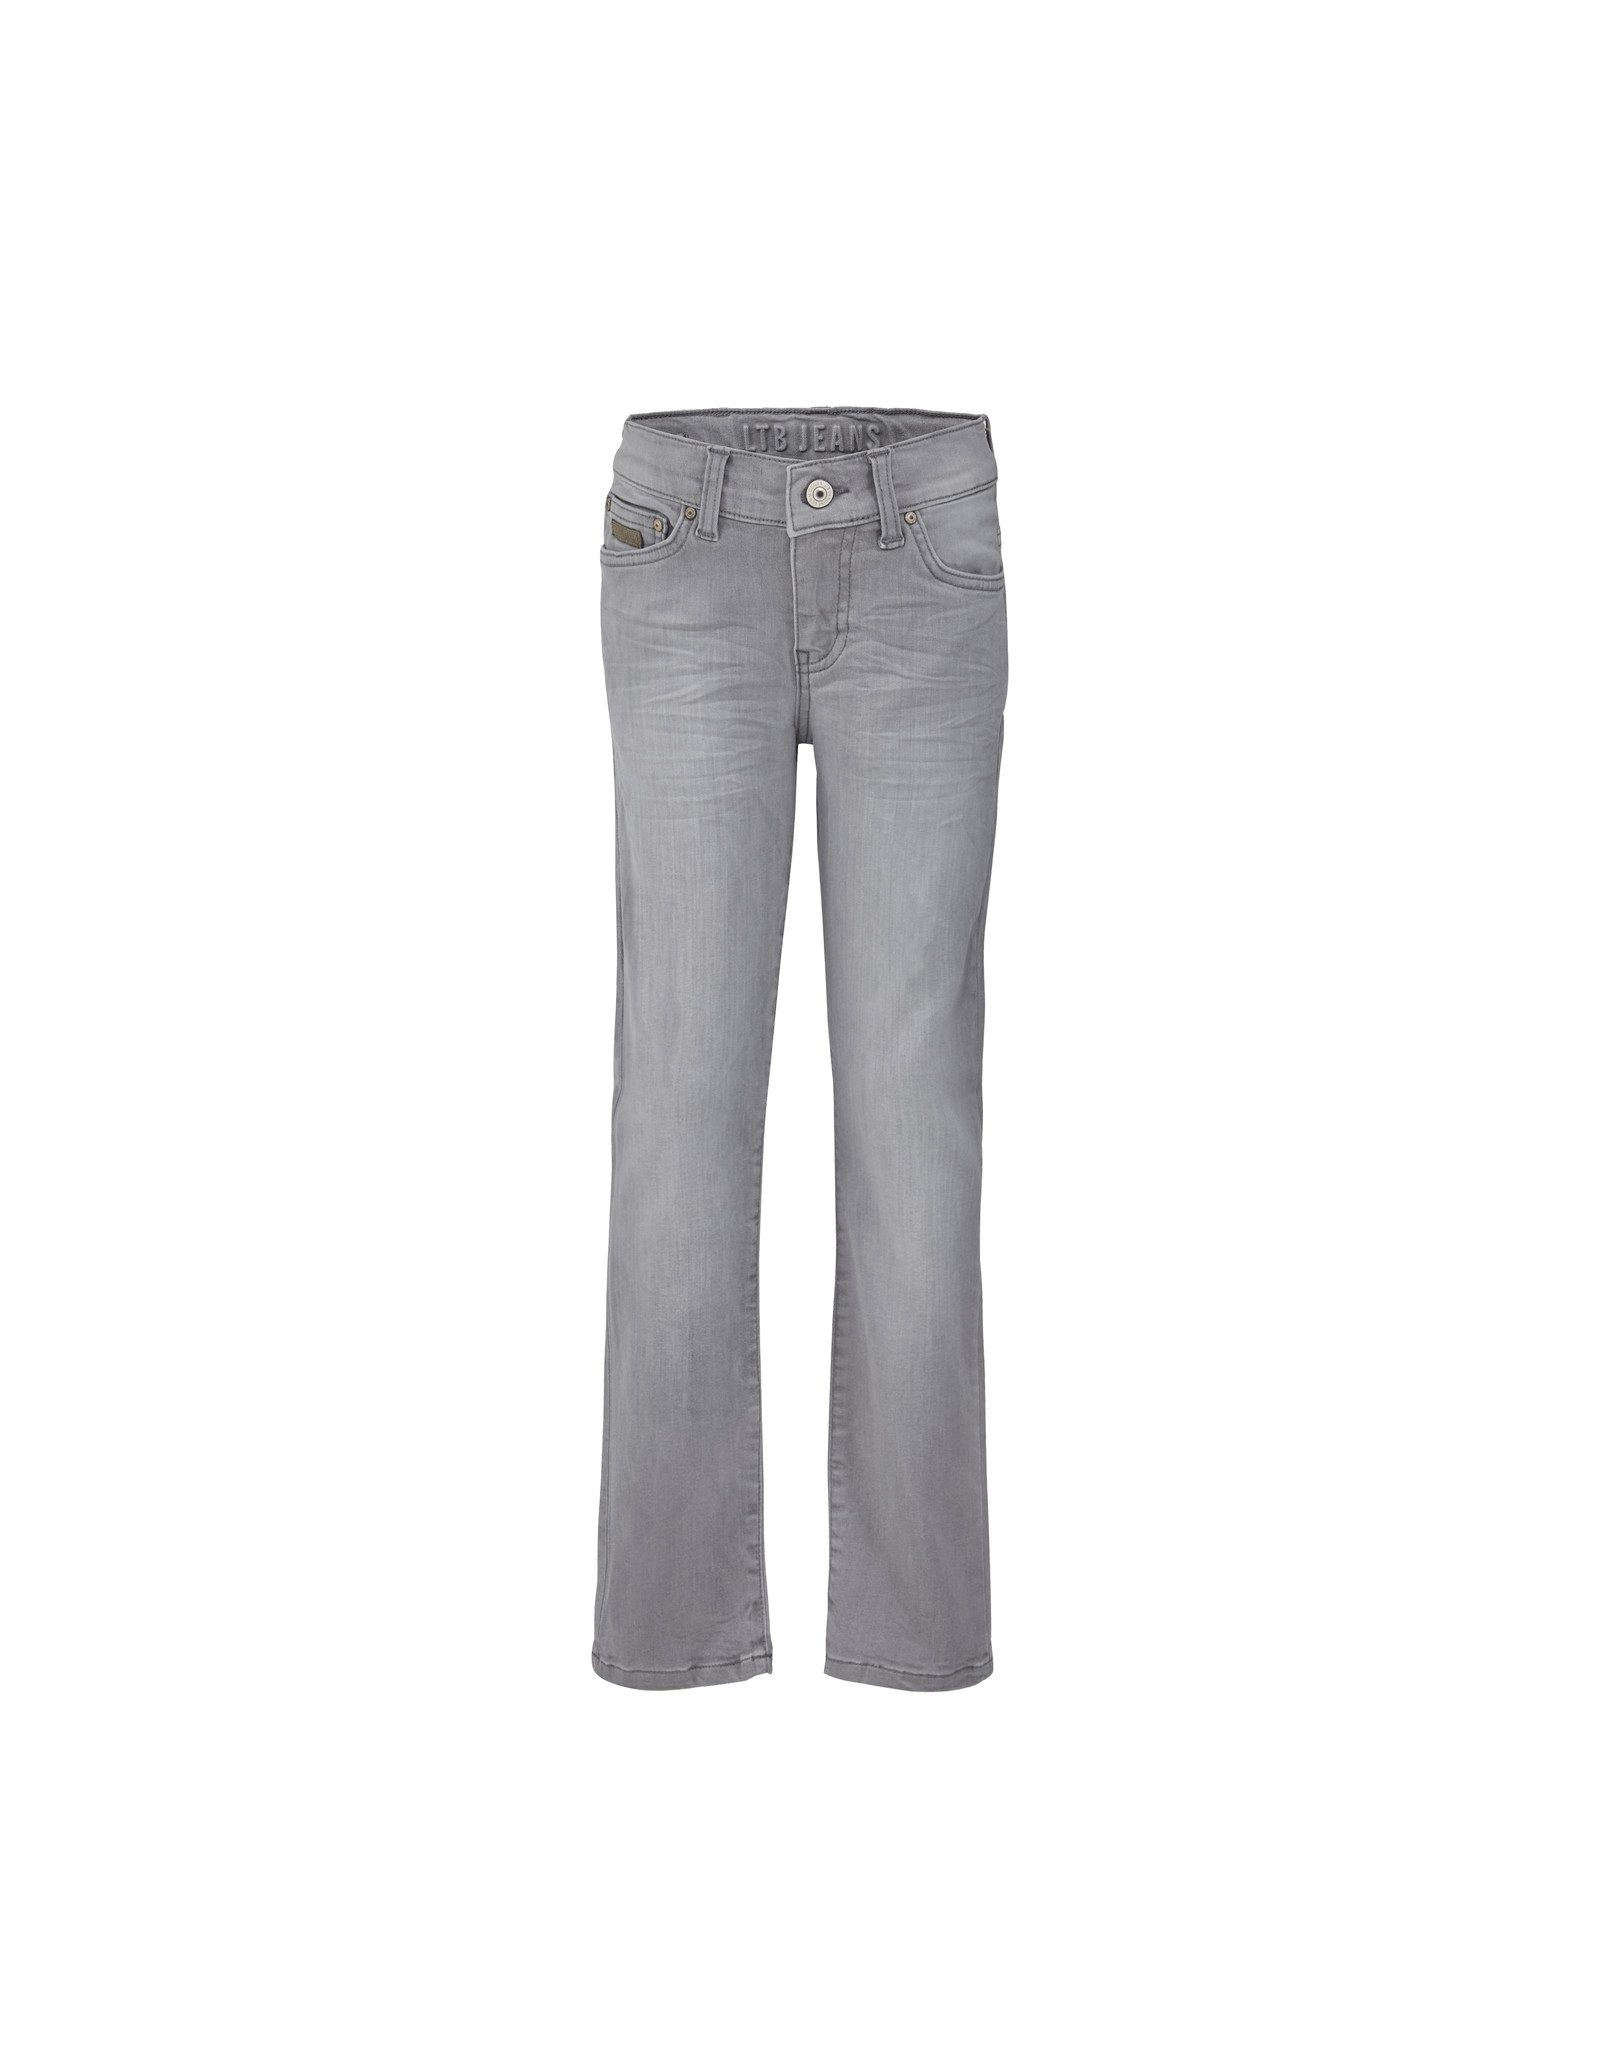 LTB Jeans LTB jongens jeans Jim Freya wash